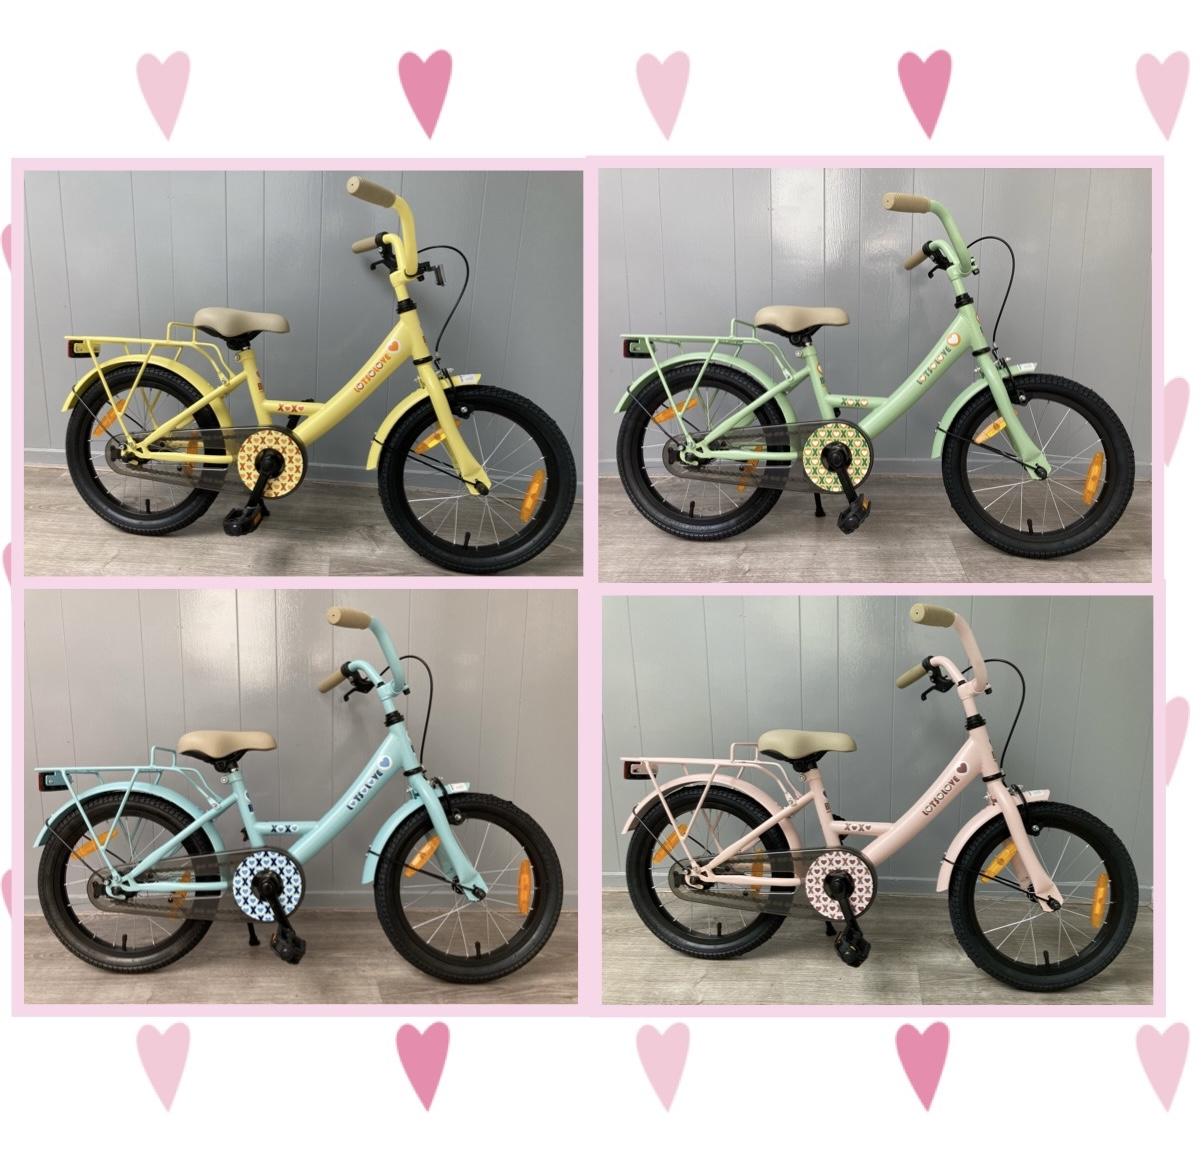 Bike Fun Lots of Love 16 inch